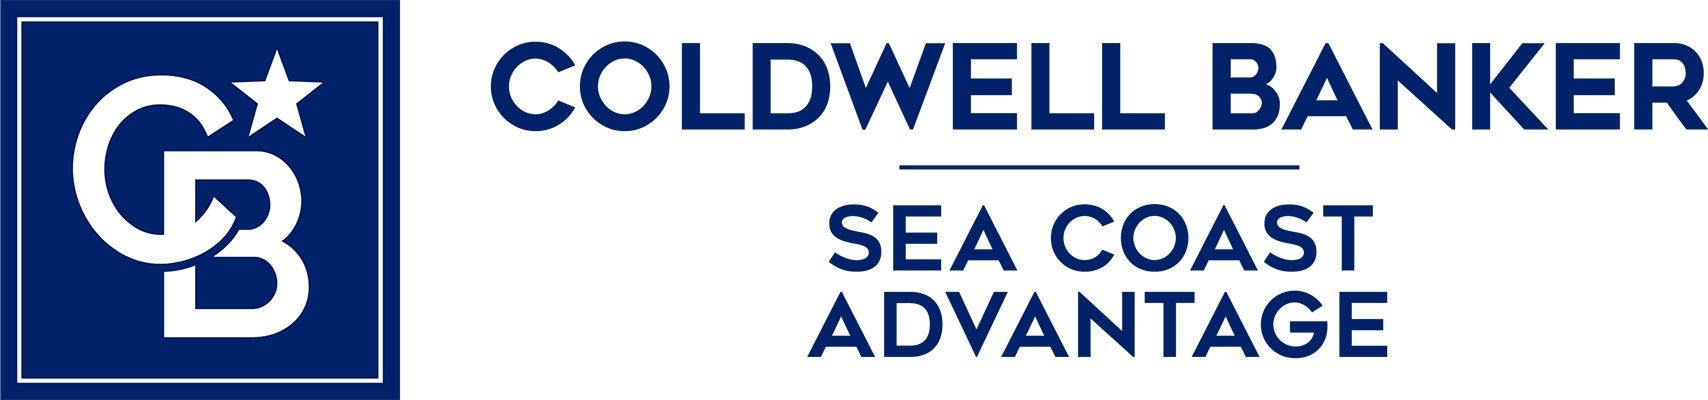 Val Hocutt - Coldwell Banker Sea Coast Advantage Realty Logo